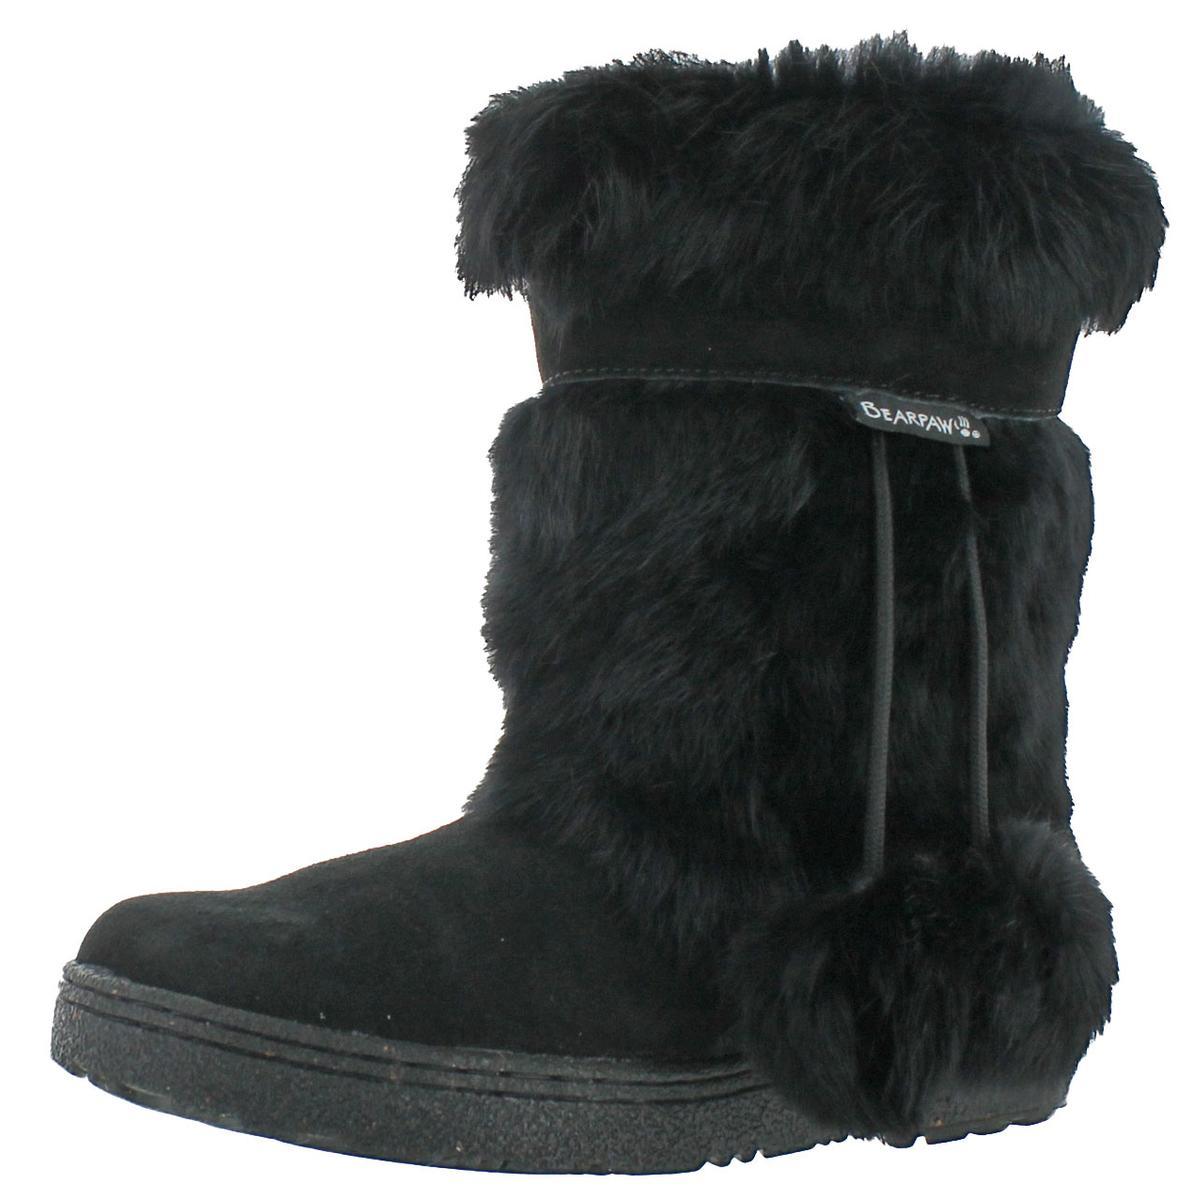 425de62976896 Details about Bearpaw Womens Tama II Black Suede Winter Boots Shoes 6  Medium (B,M) BHFO 0205